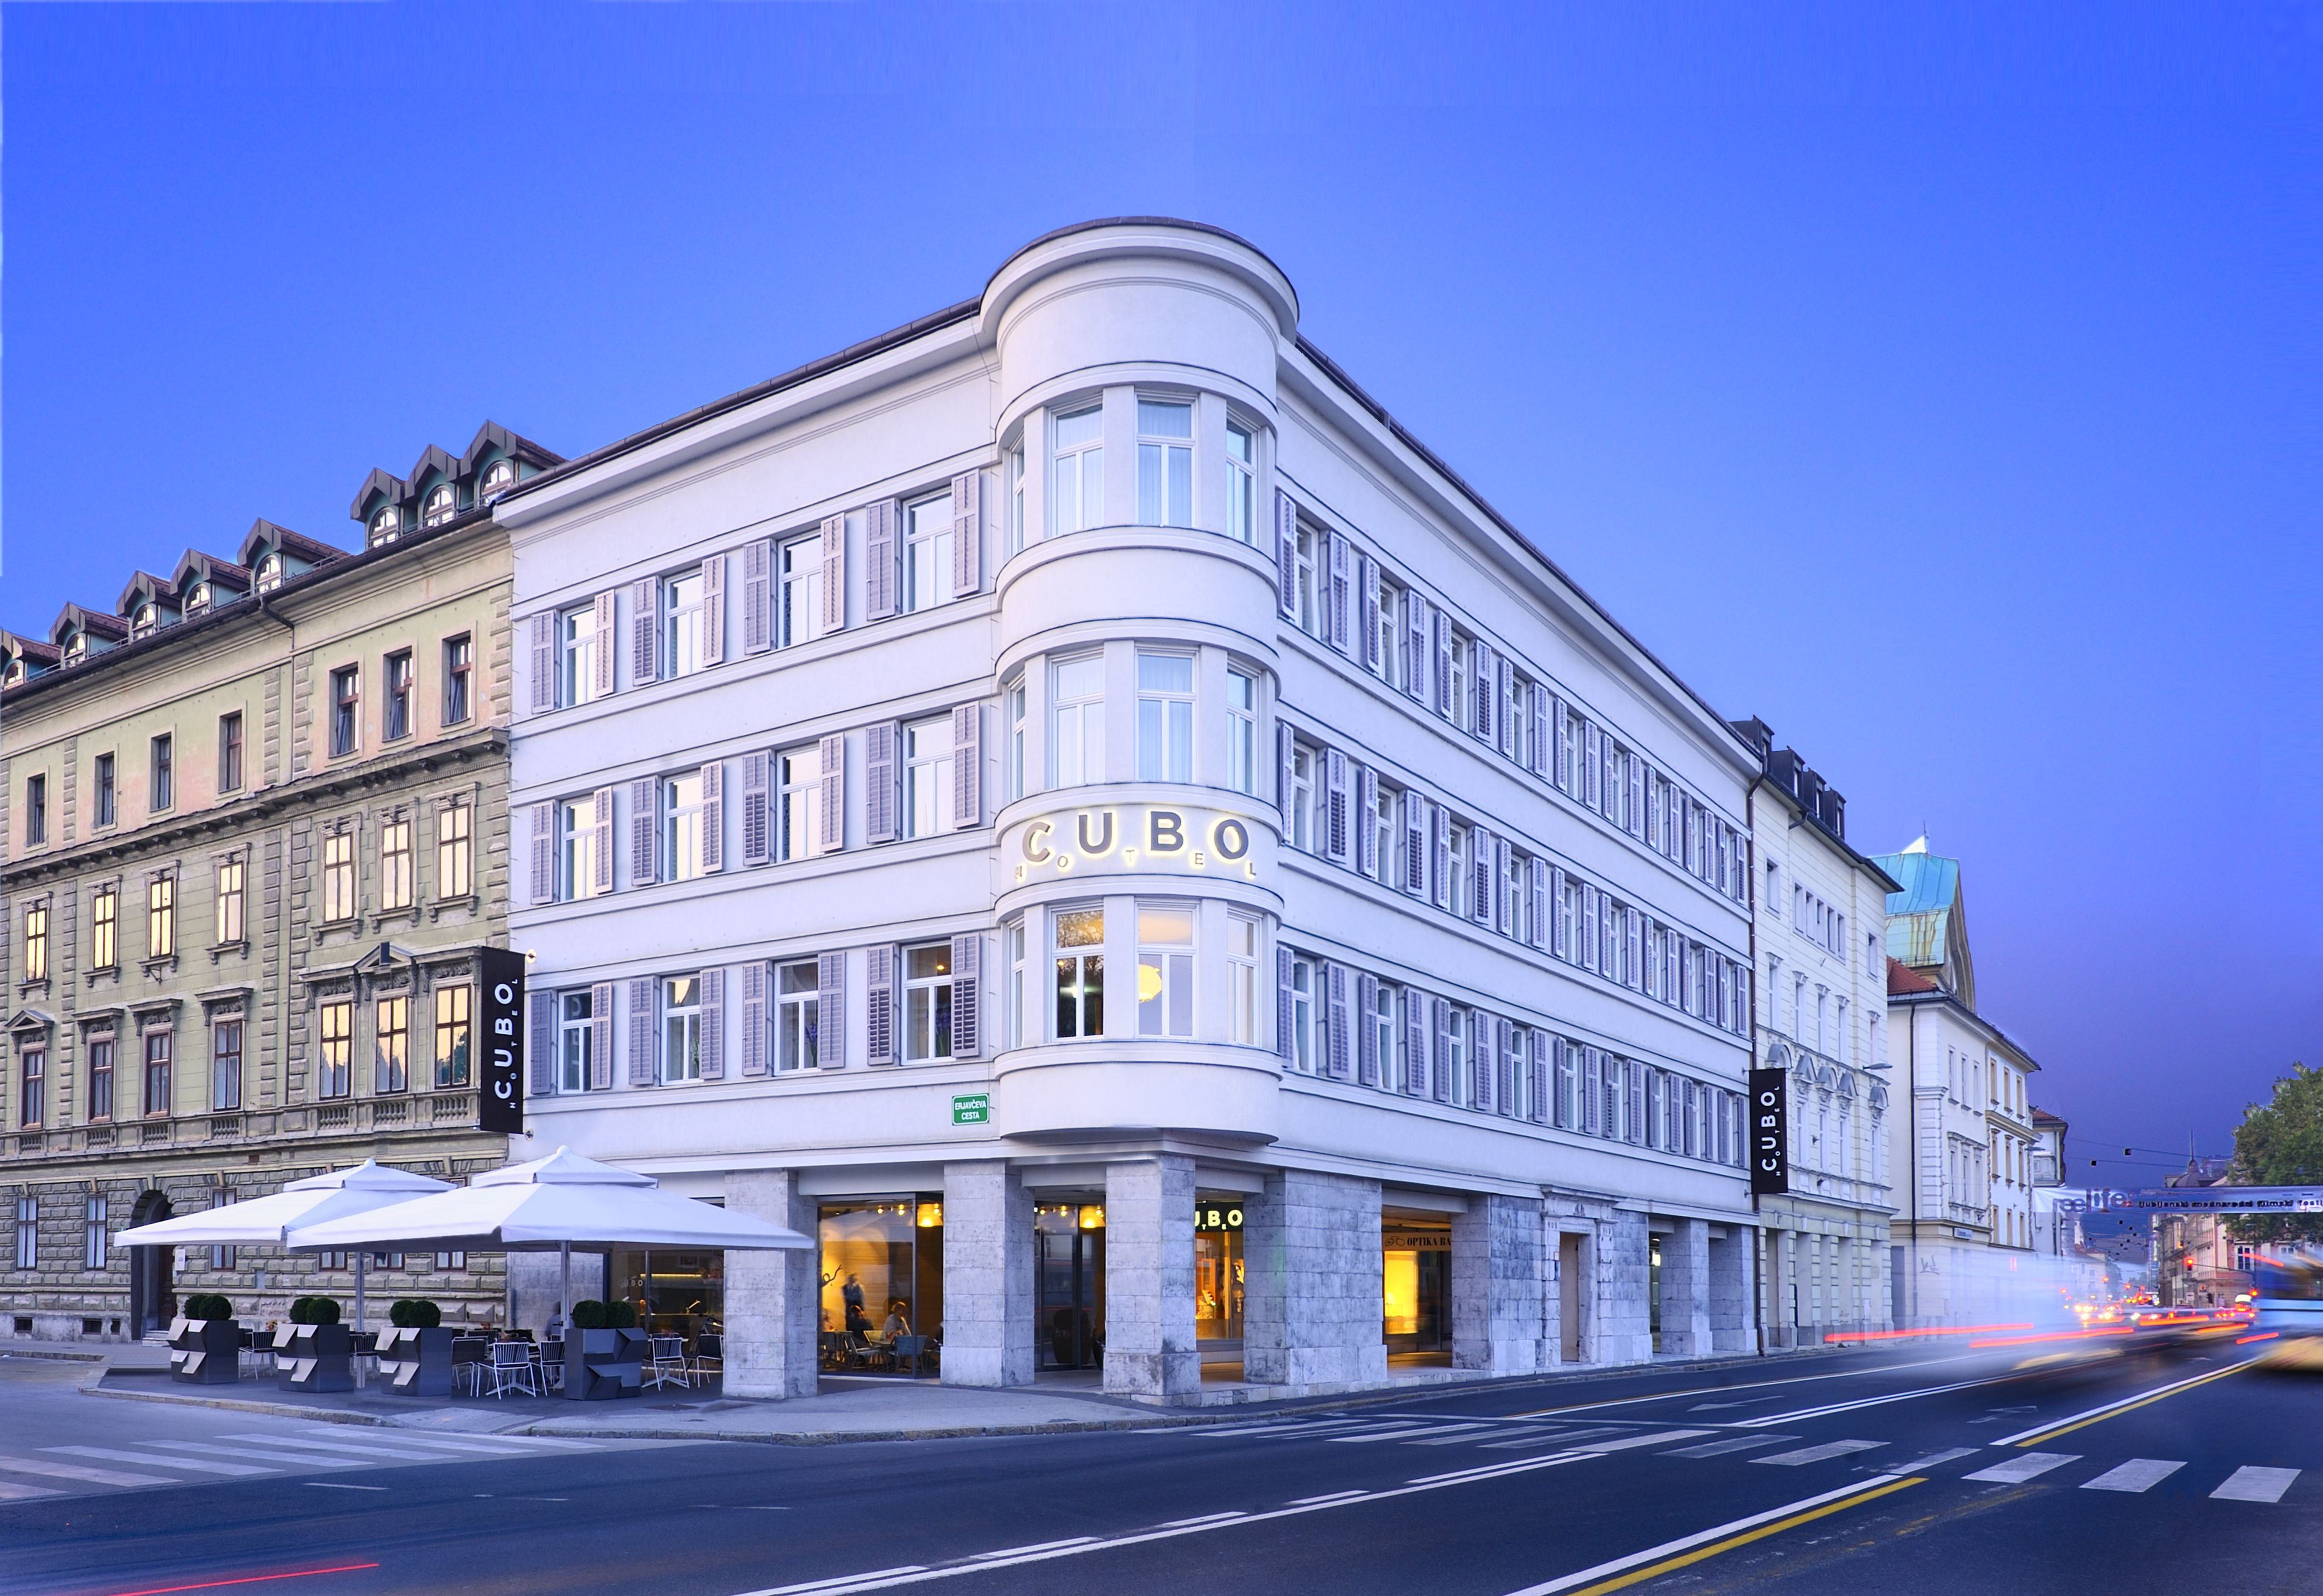 HOTEL CUBO Image